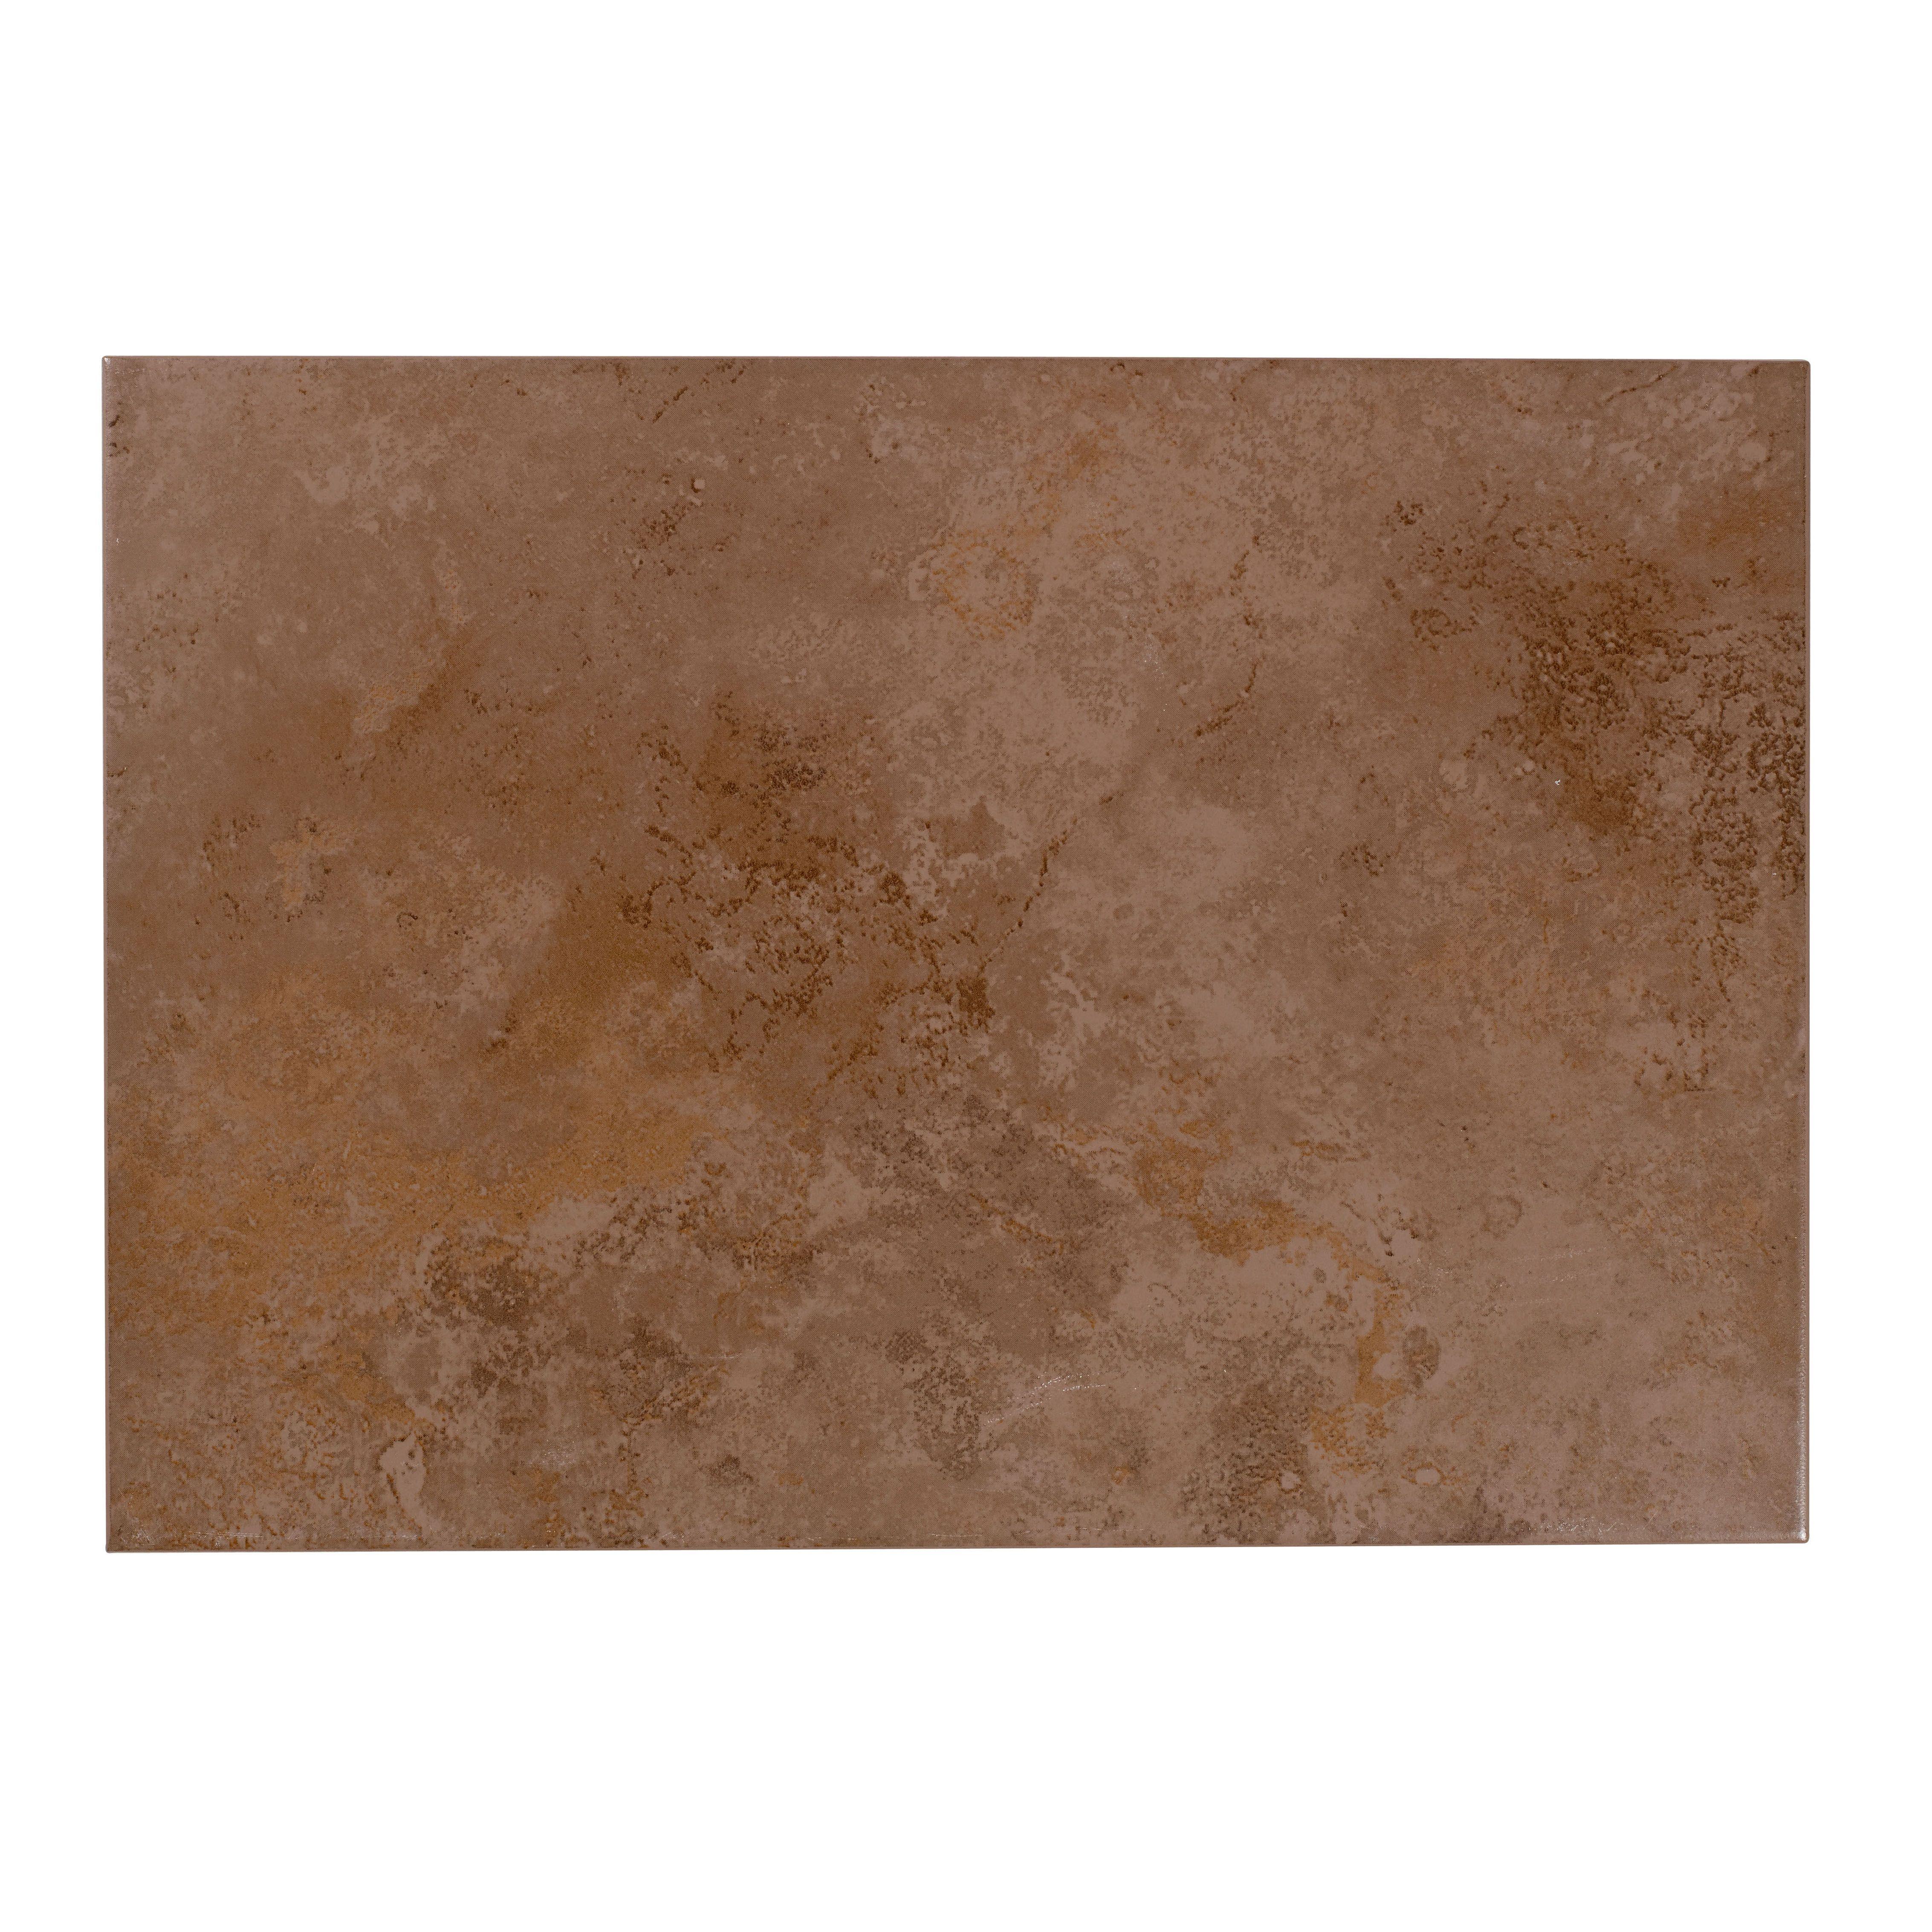 Oscano Graphite Stone Effect Ceramic Wall Floor Tile: DIY At B&Q